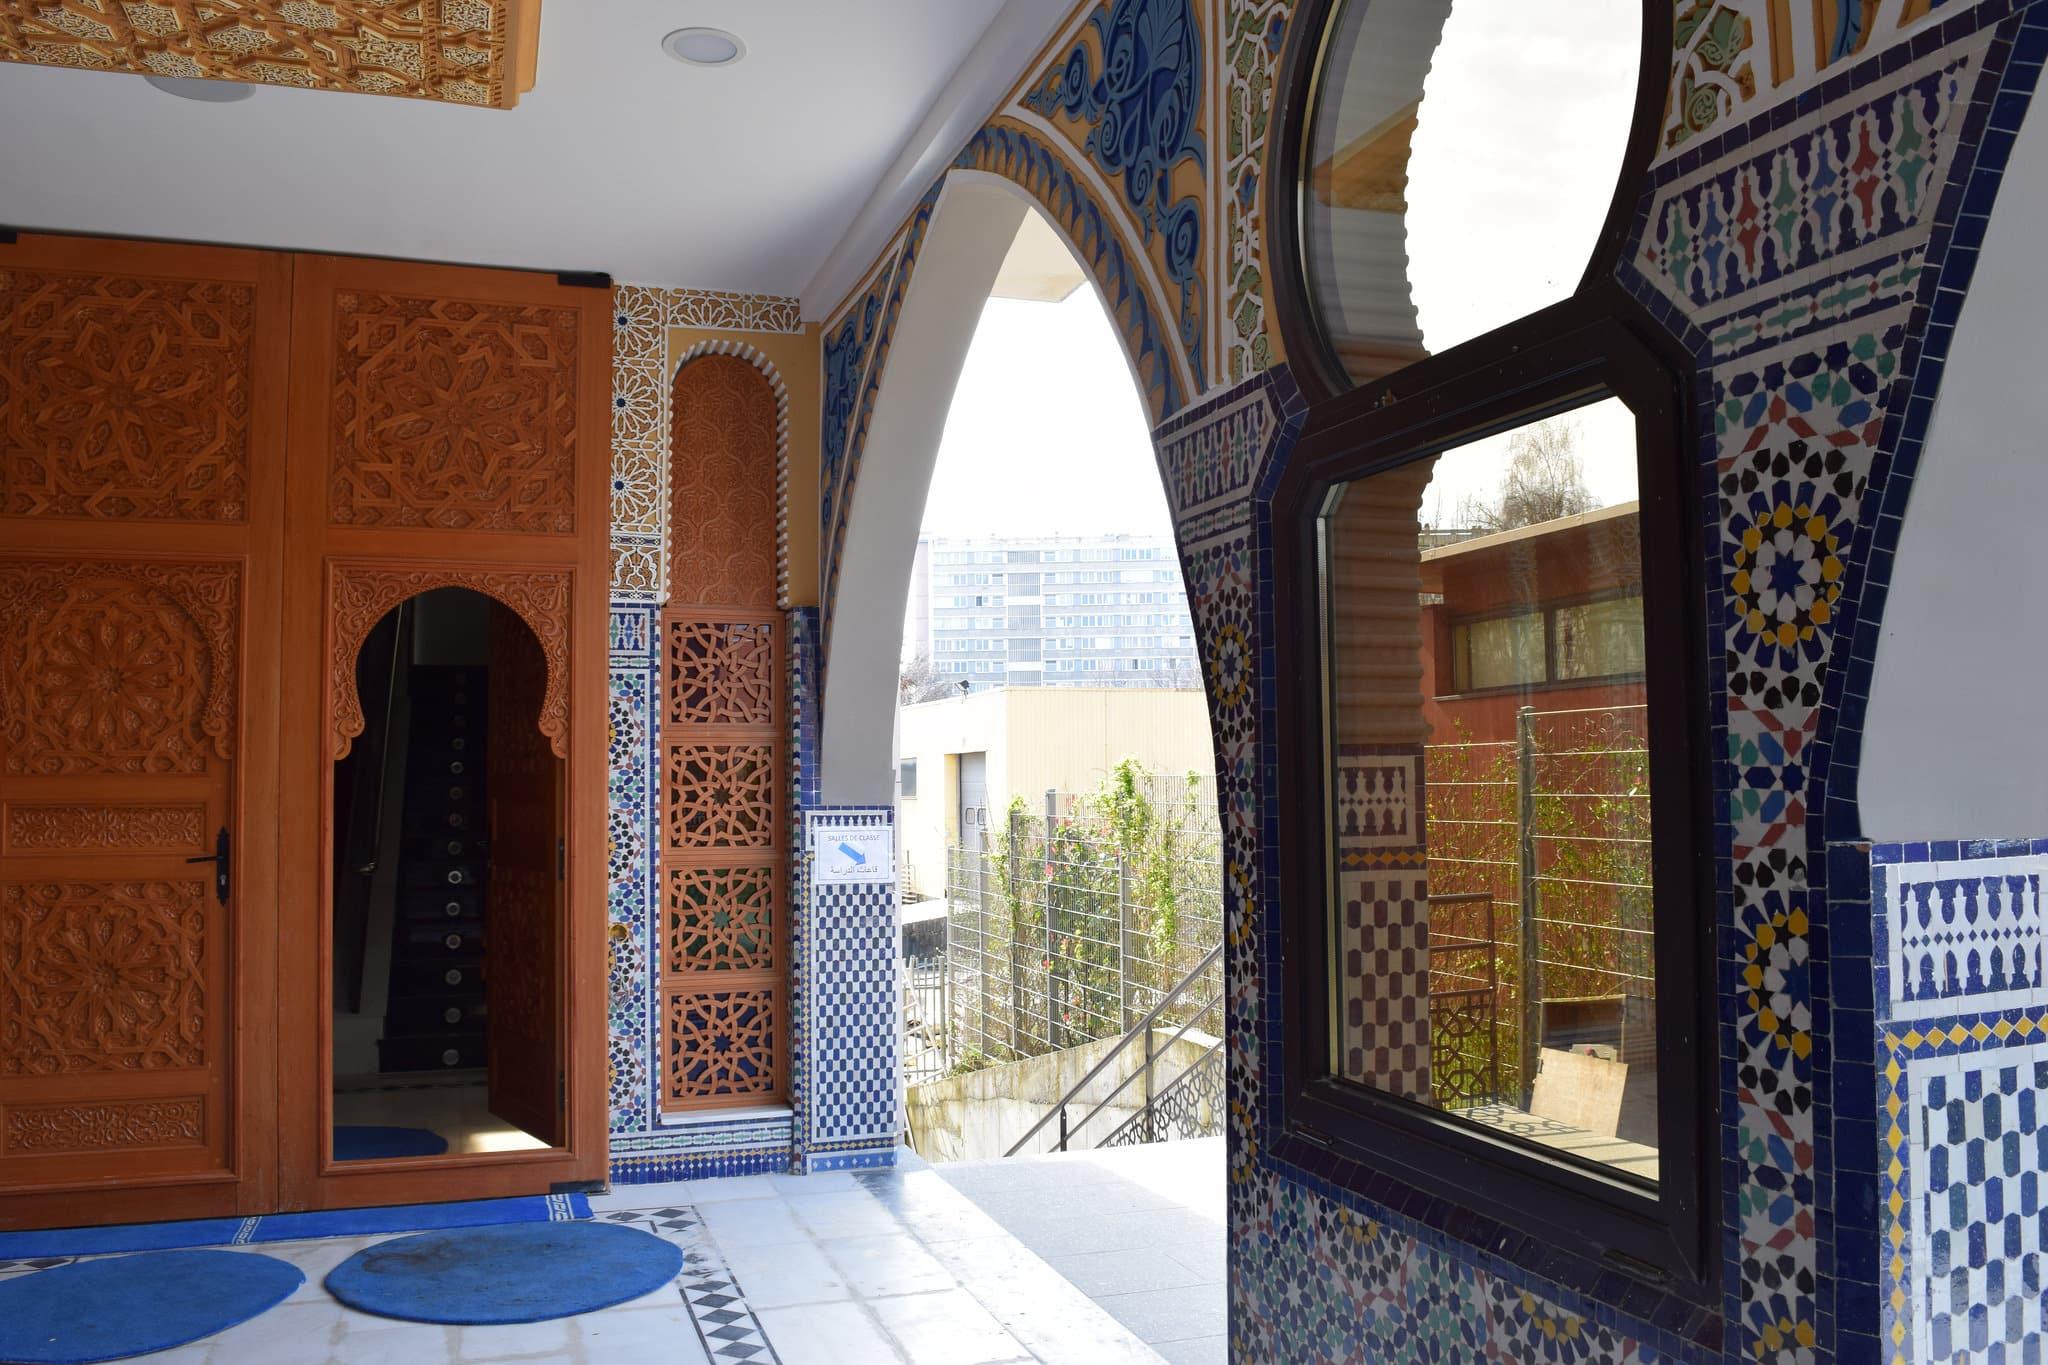 Mosquée de Chevilly Larue